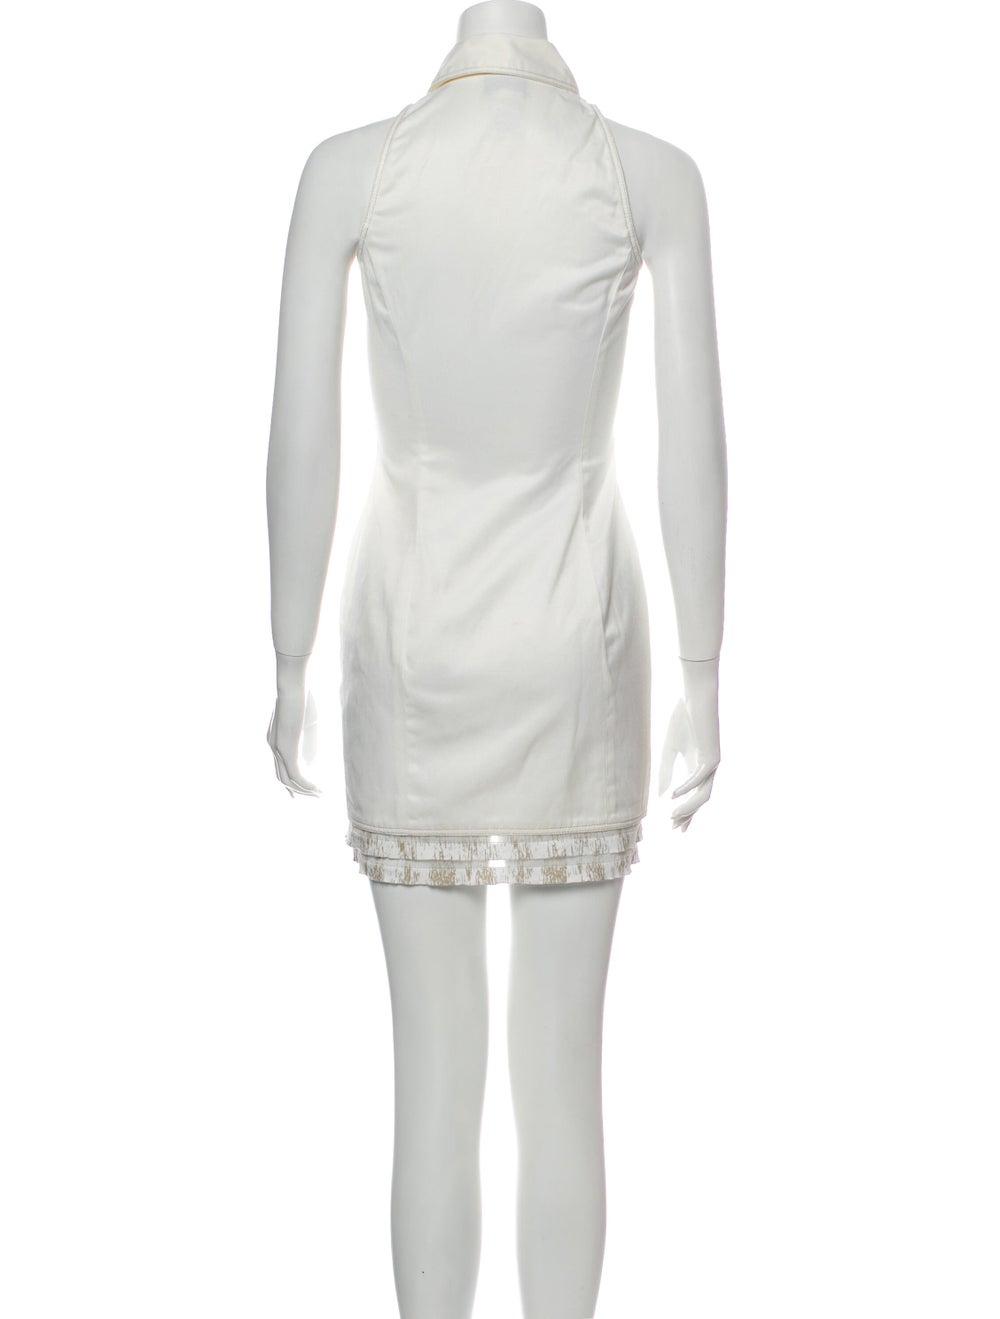 Versace Mini Dress - image 3